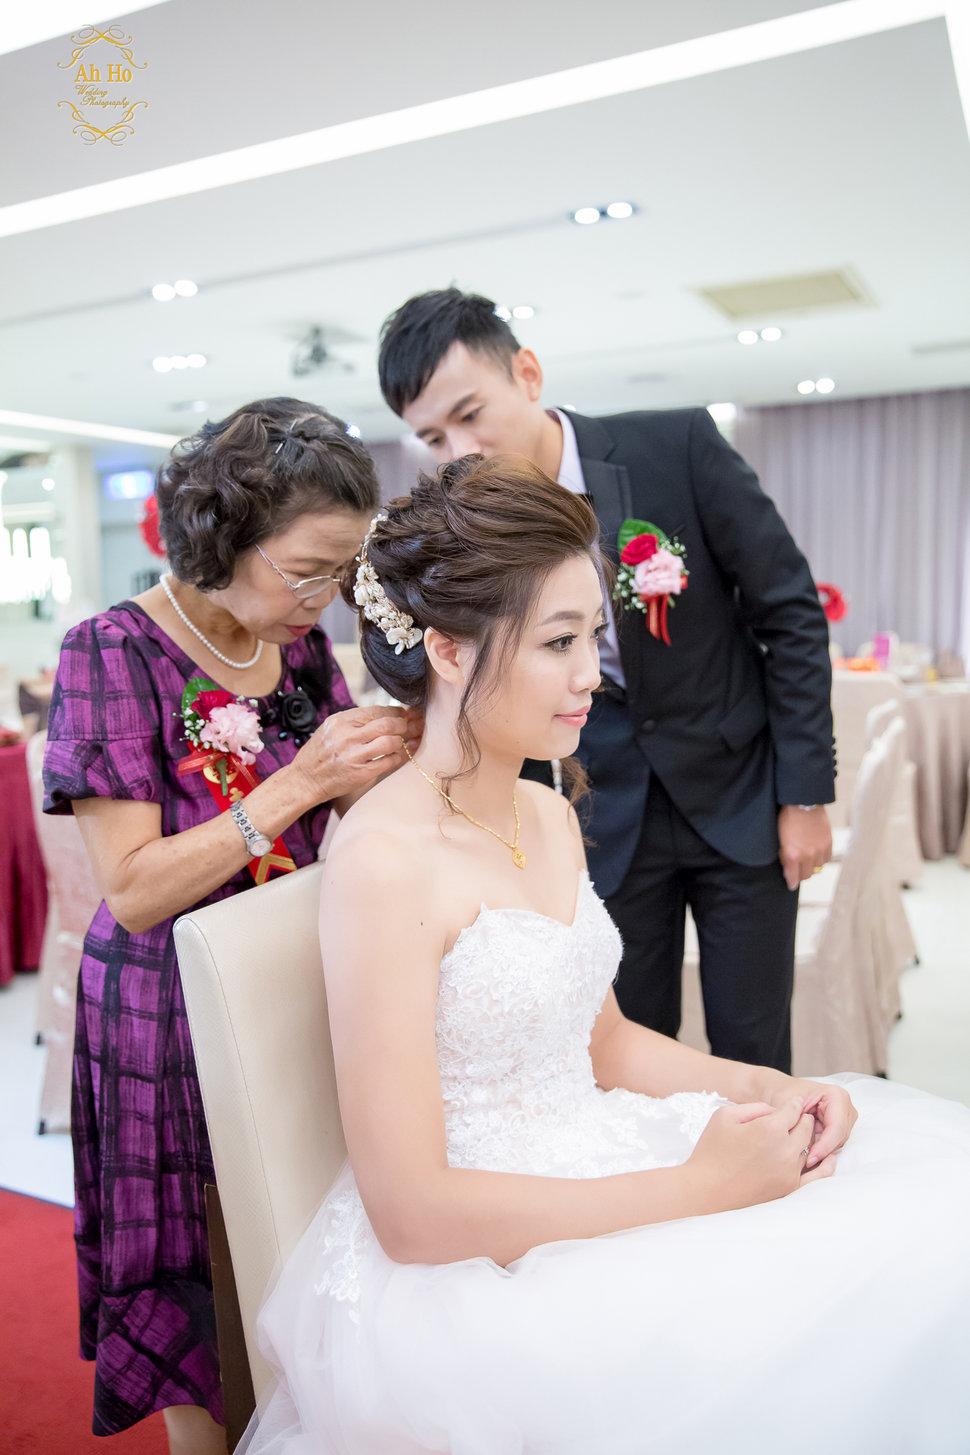 AhHo Wedding TEL-0937797161 lineID-chiupeiho (71 - 411) - AhHoWedding/阿河婚攝《結婚吧》